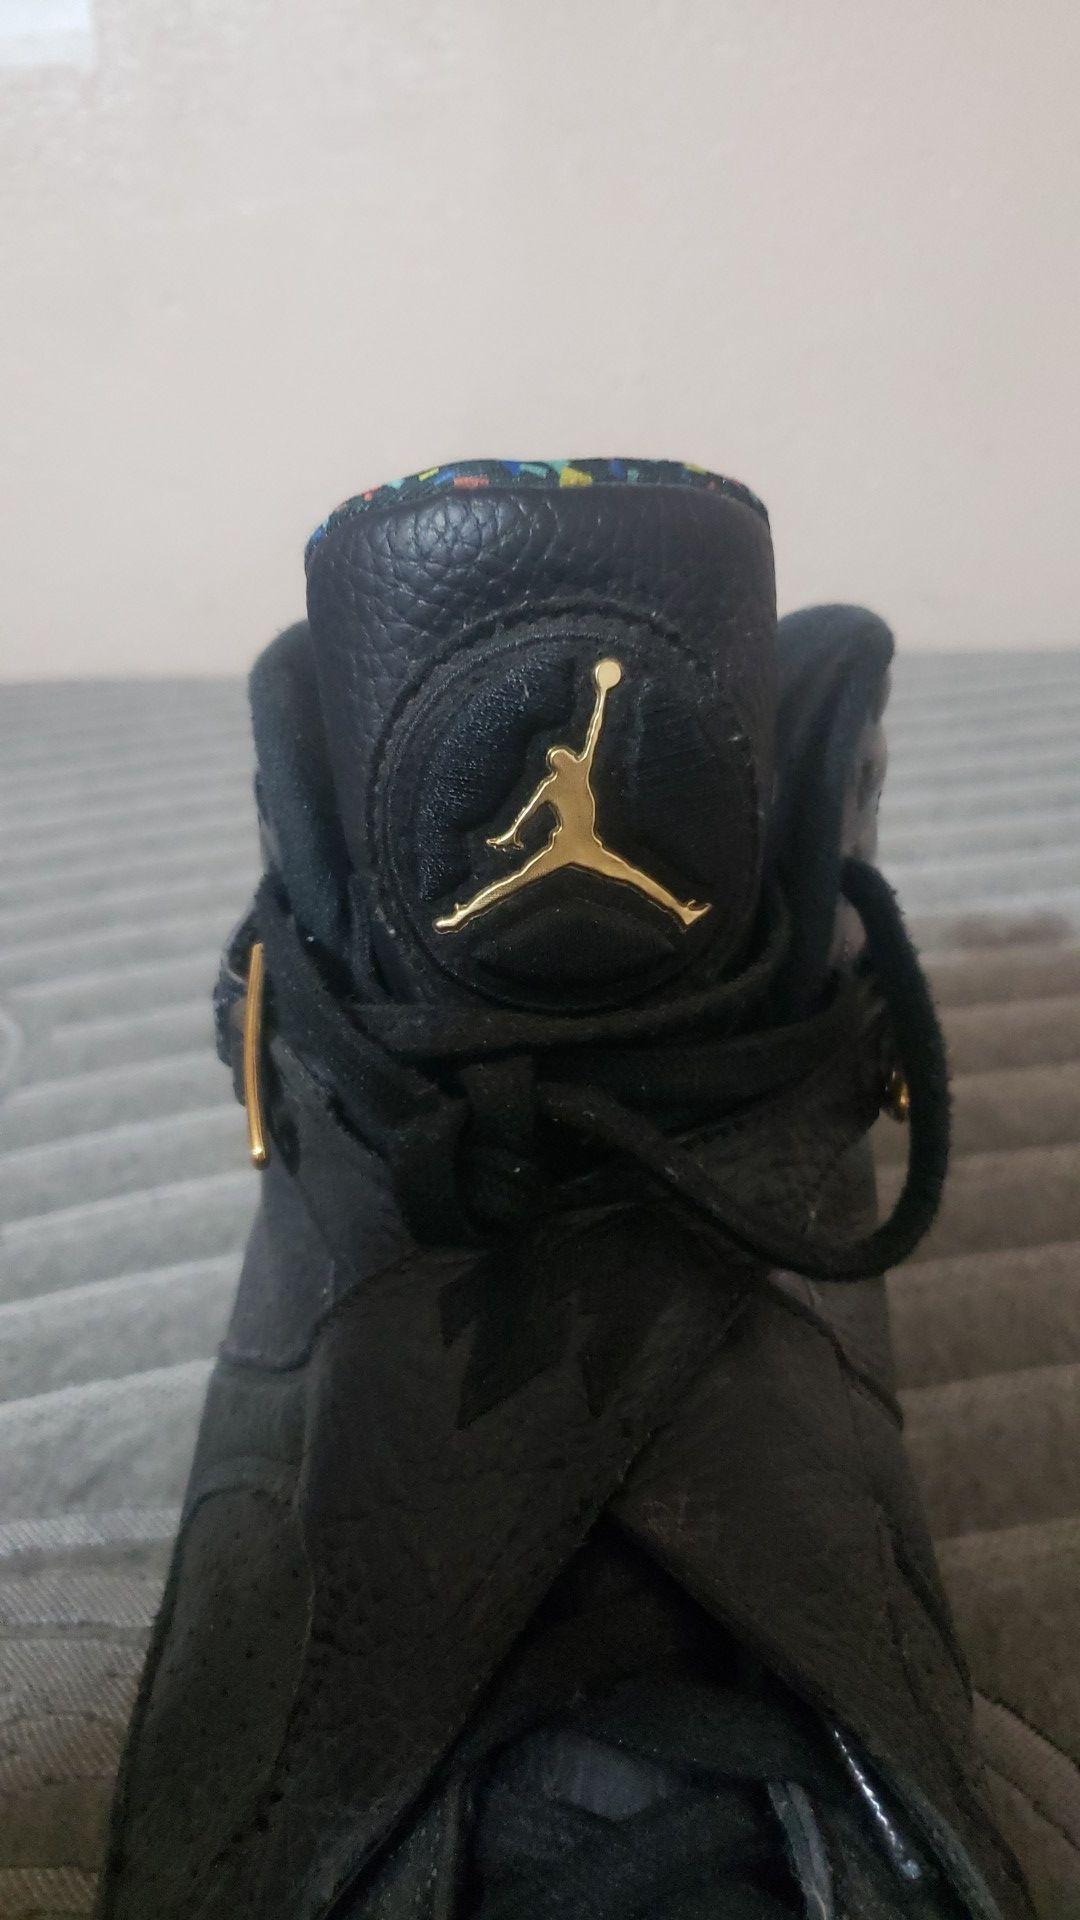 Jordan 8 champ pack confetti eights